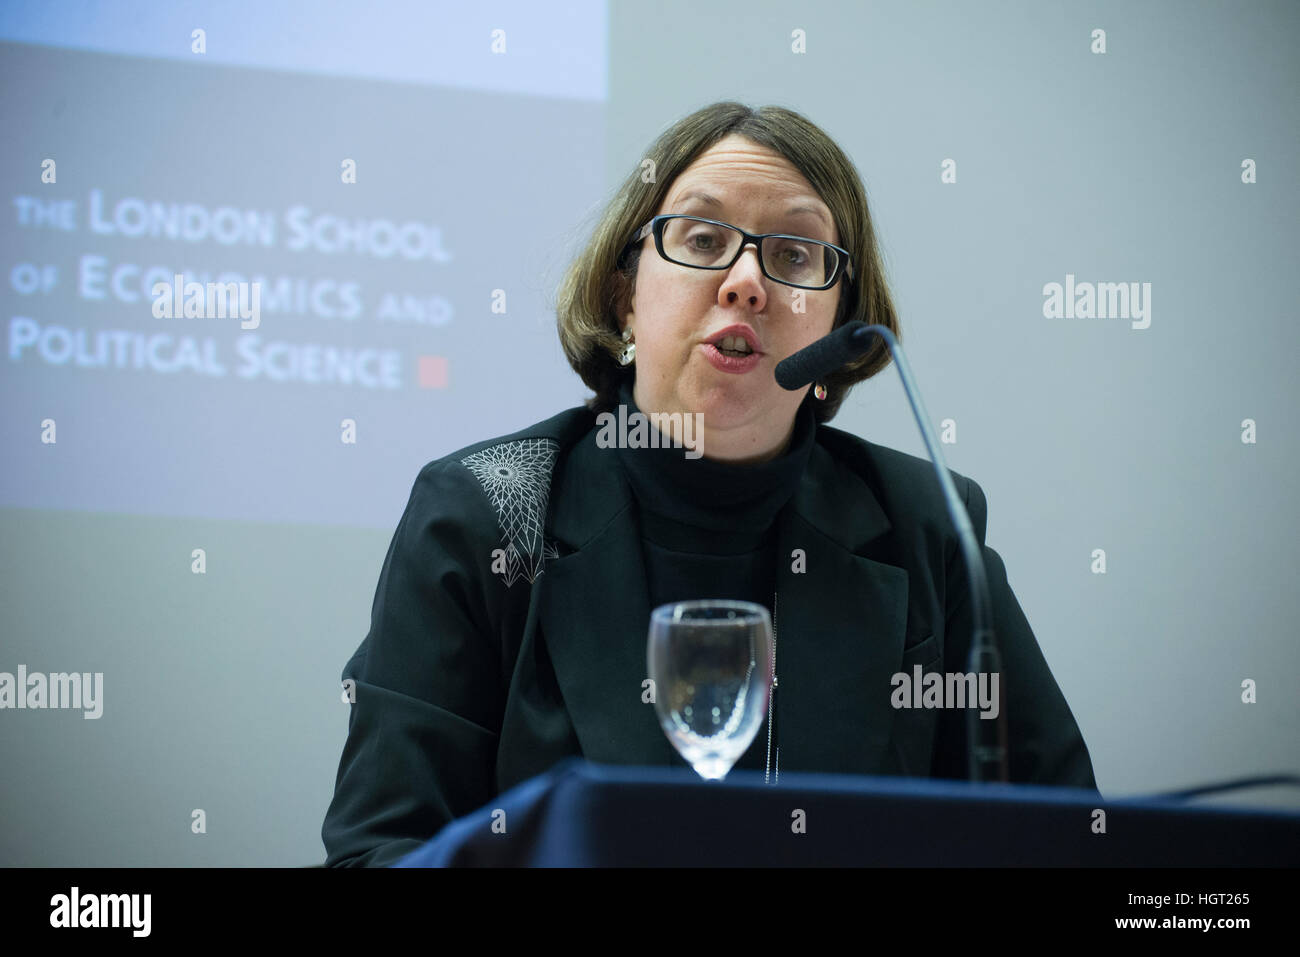 London, UK. 12th January 2017. Dr Jennifer Jackson Preece, Associate Professor of Nationalism in Europe at the London - Stock Image